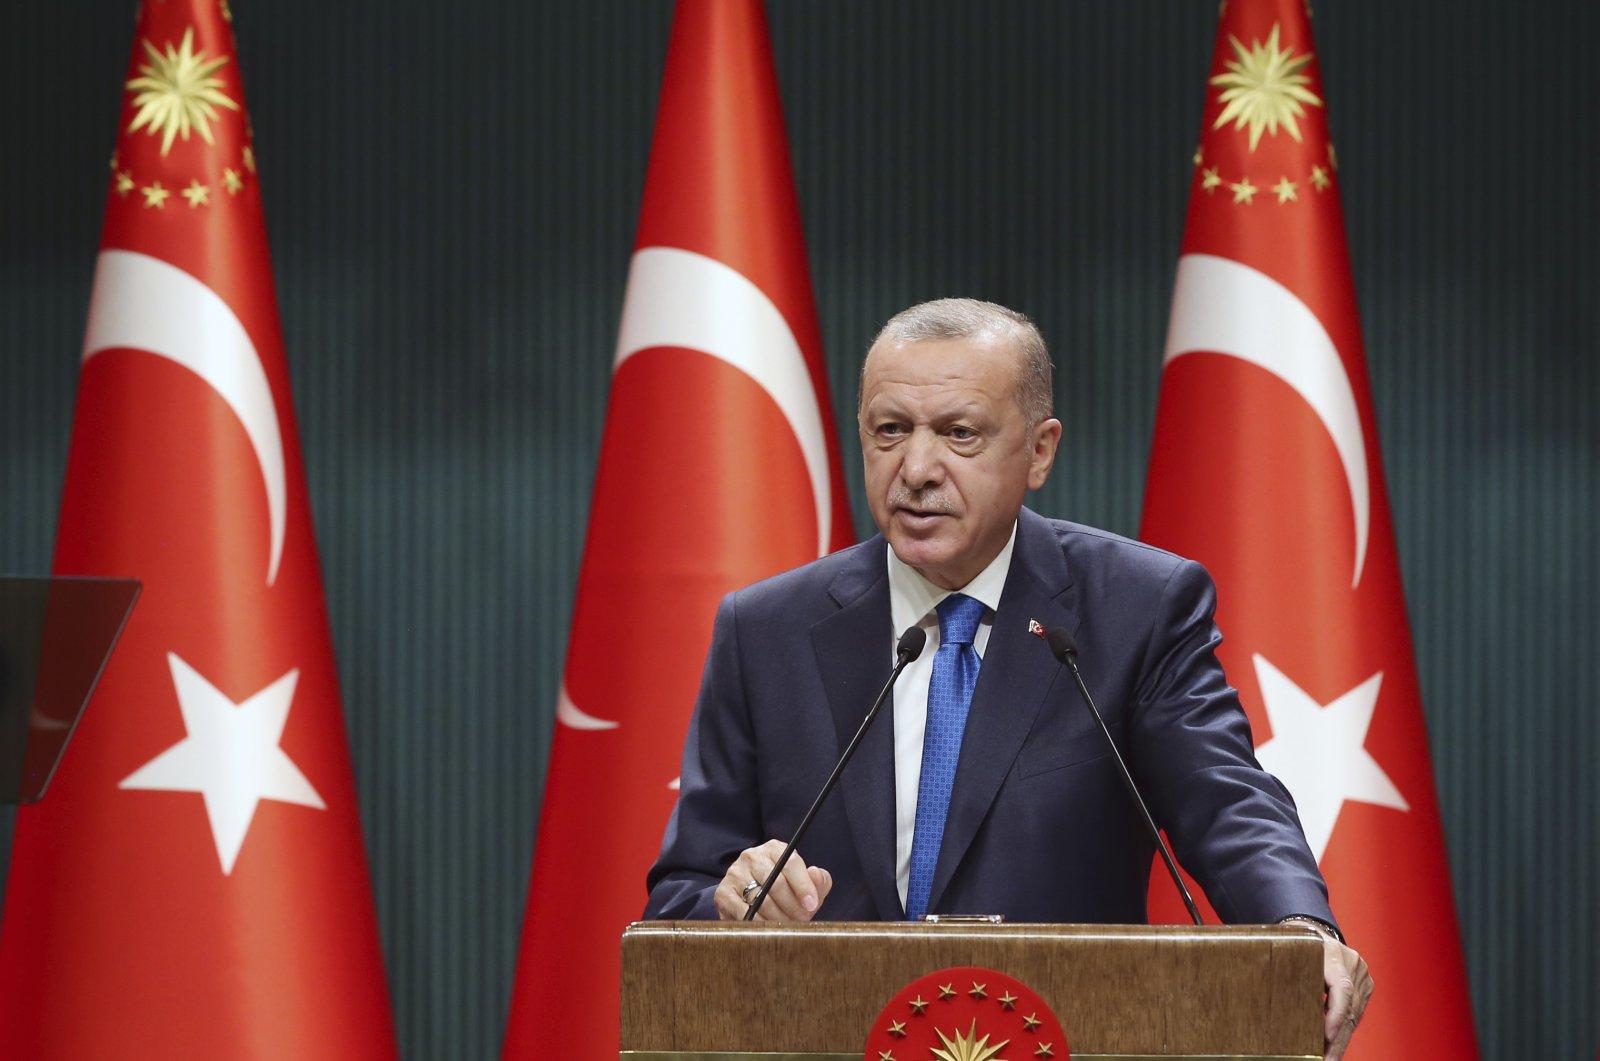 President Recep Tayyip Erdoğan speaks after a Cabinet meeting in Ankara, Turkey, Monday, Sept. 7, 2020. (AP Photo)